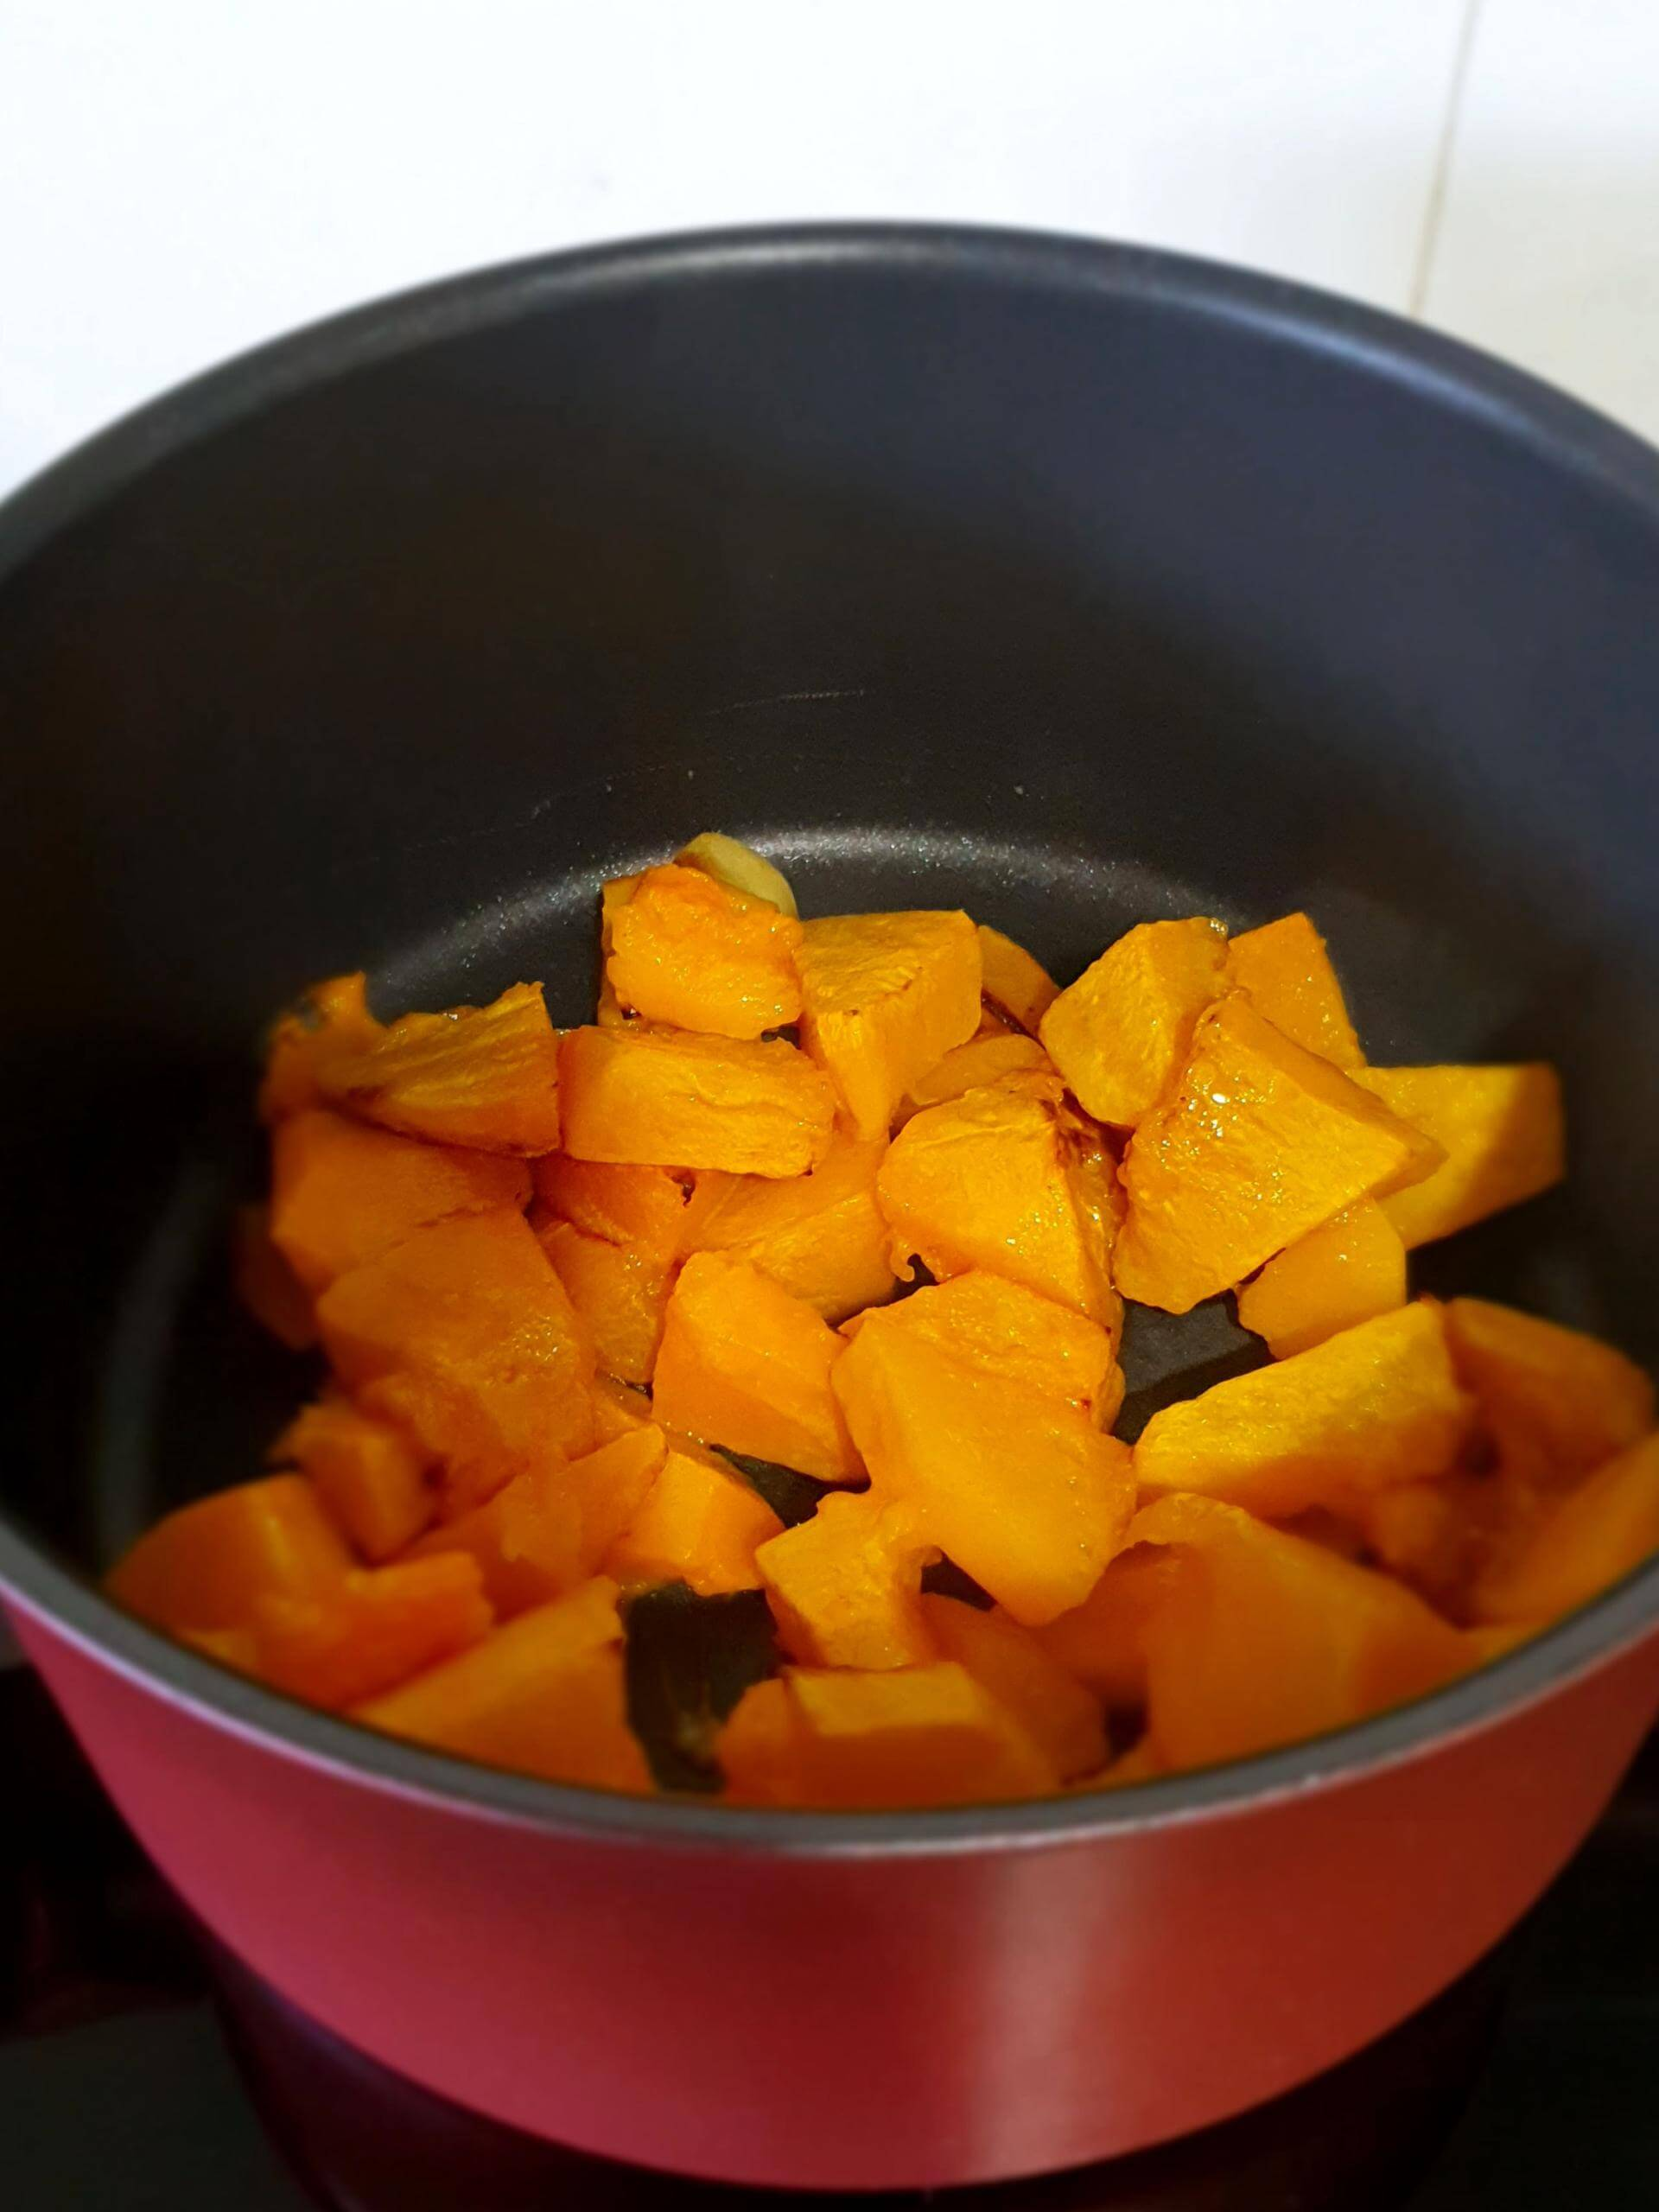 Roasted pumpkin & garlic soup